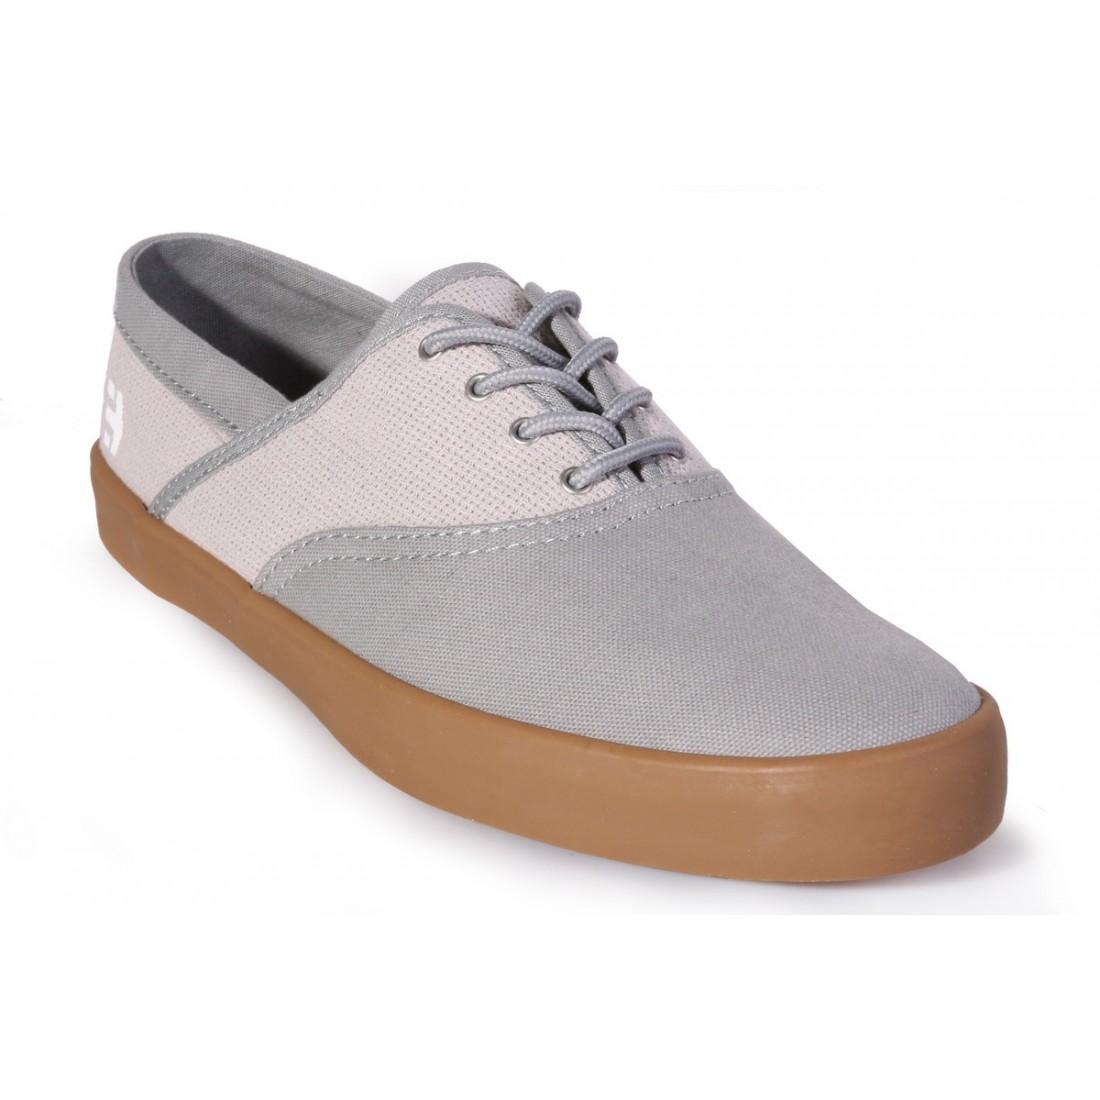 CORBY grey gum